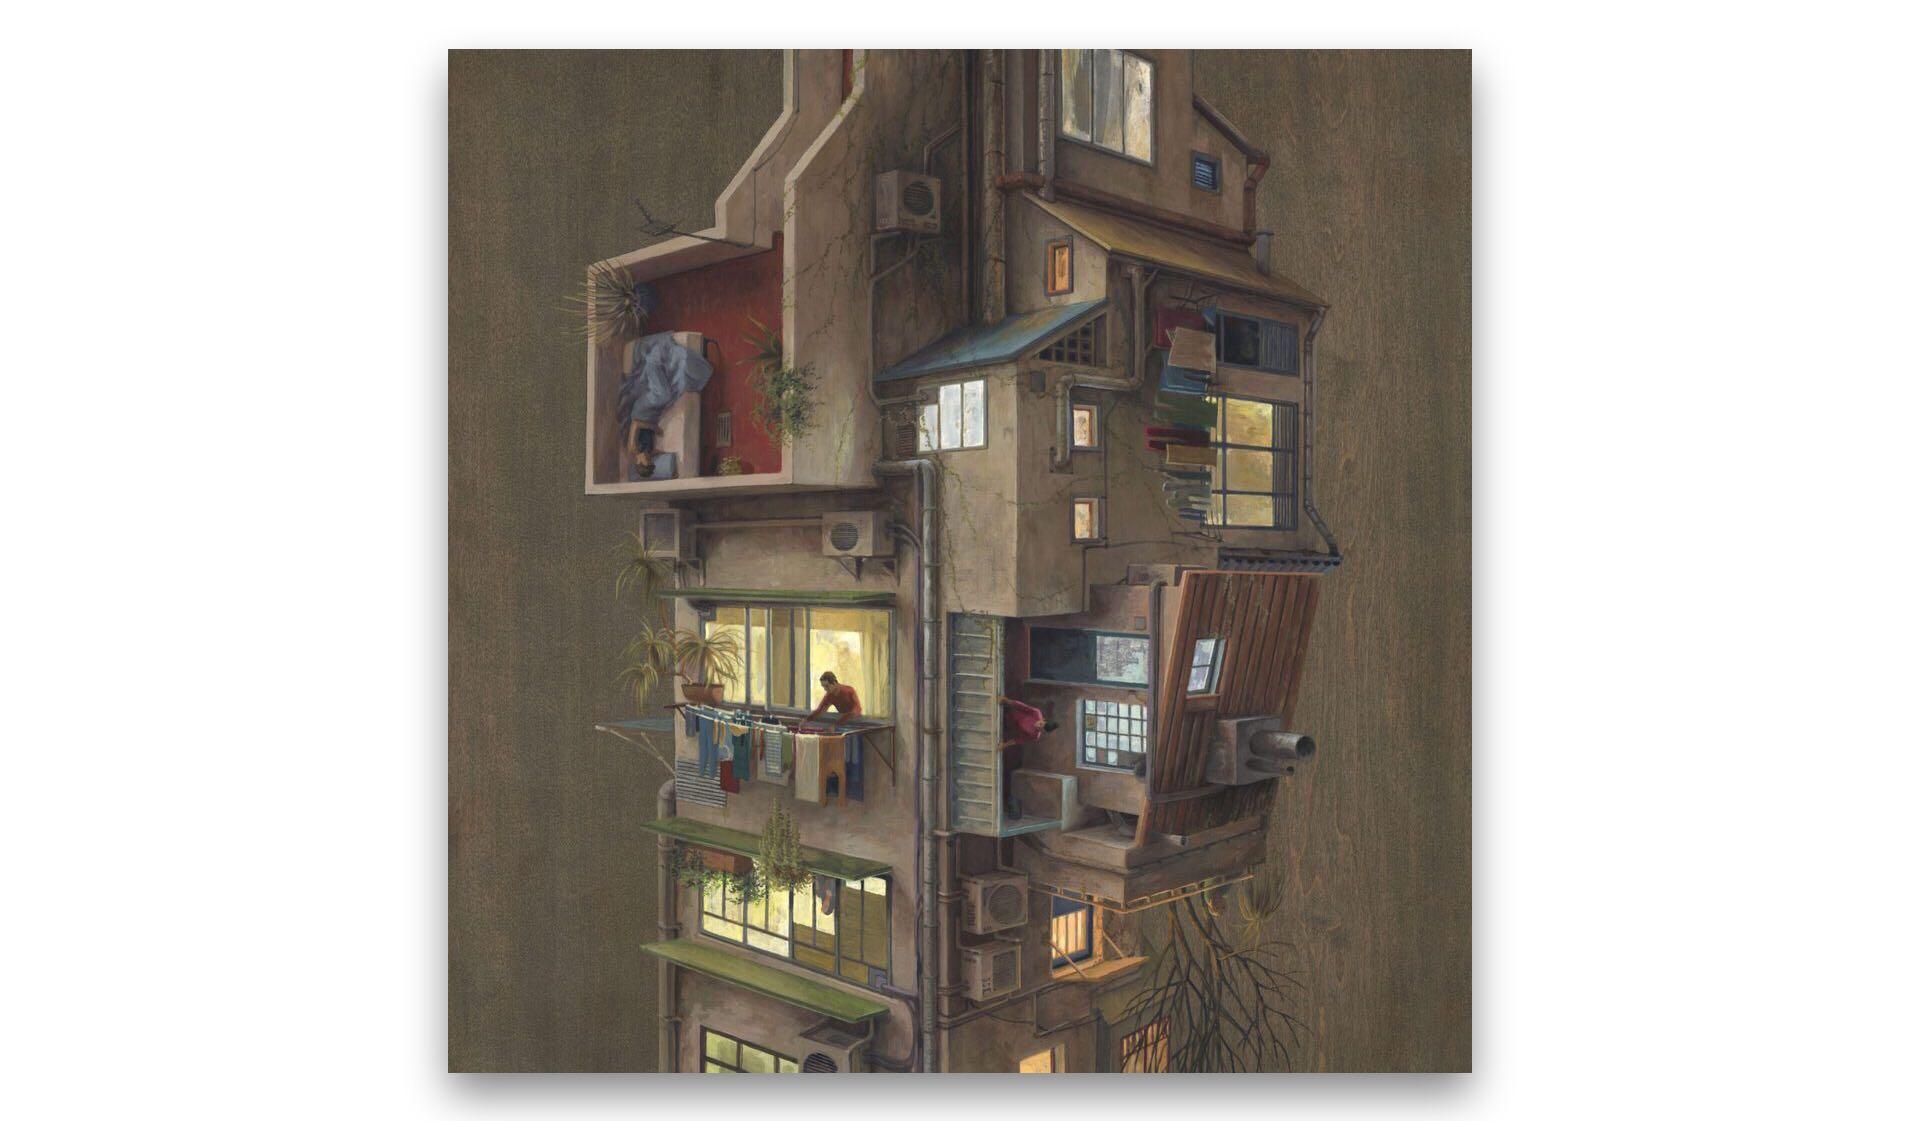 urban-evening-print-by-cinta-vidal-x-colossal